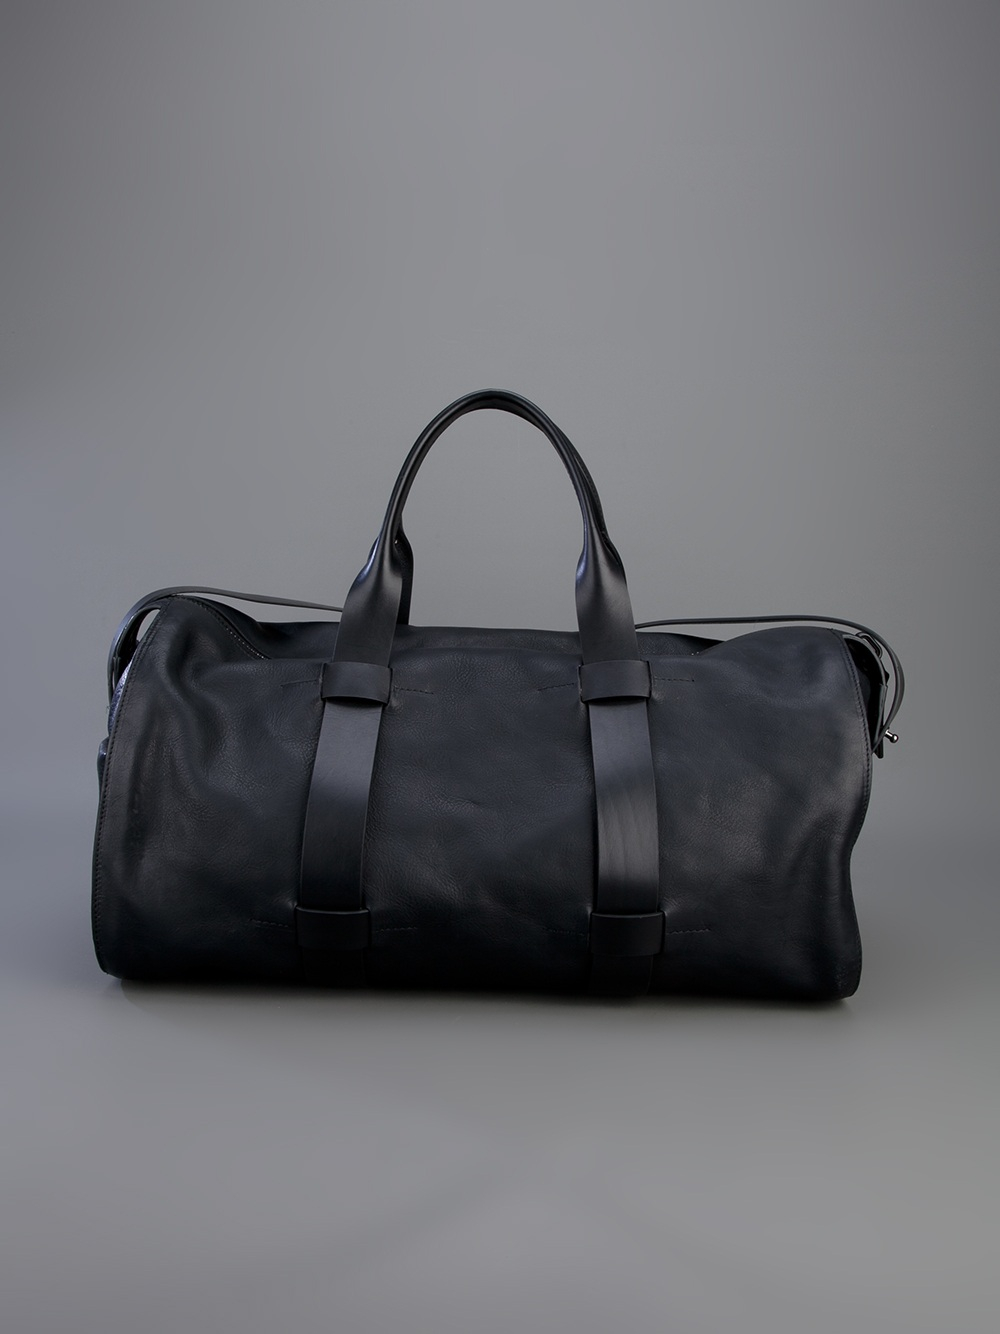 0732c3f8e34f Lyst - Troubadour Day Bag in Black for Men